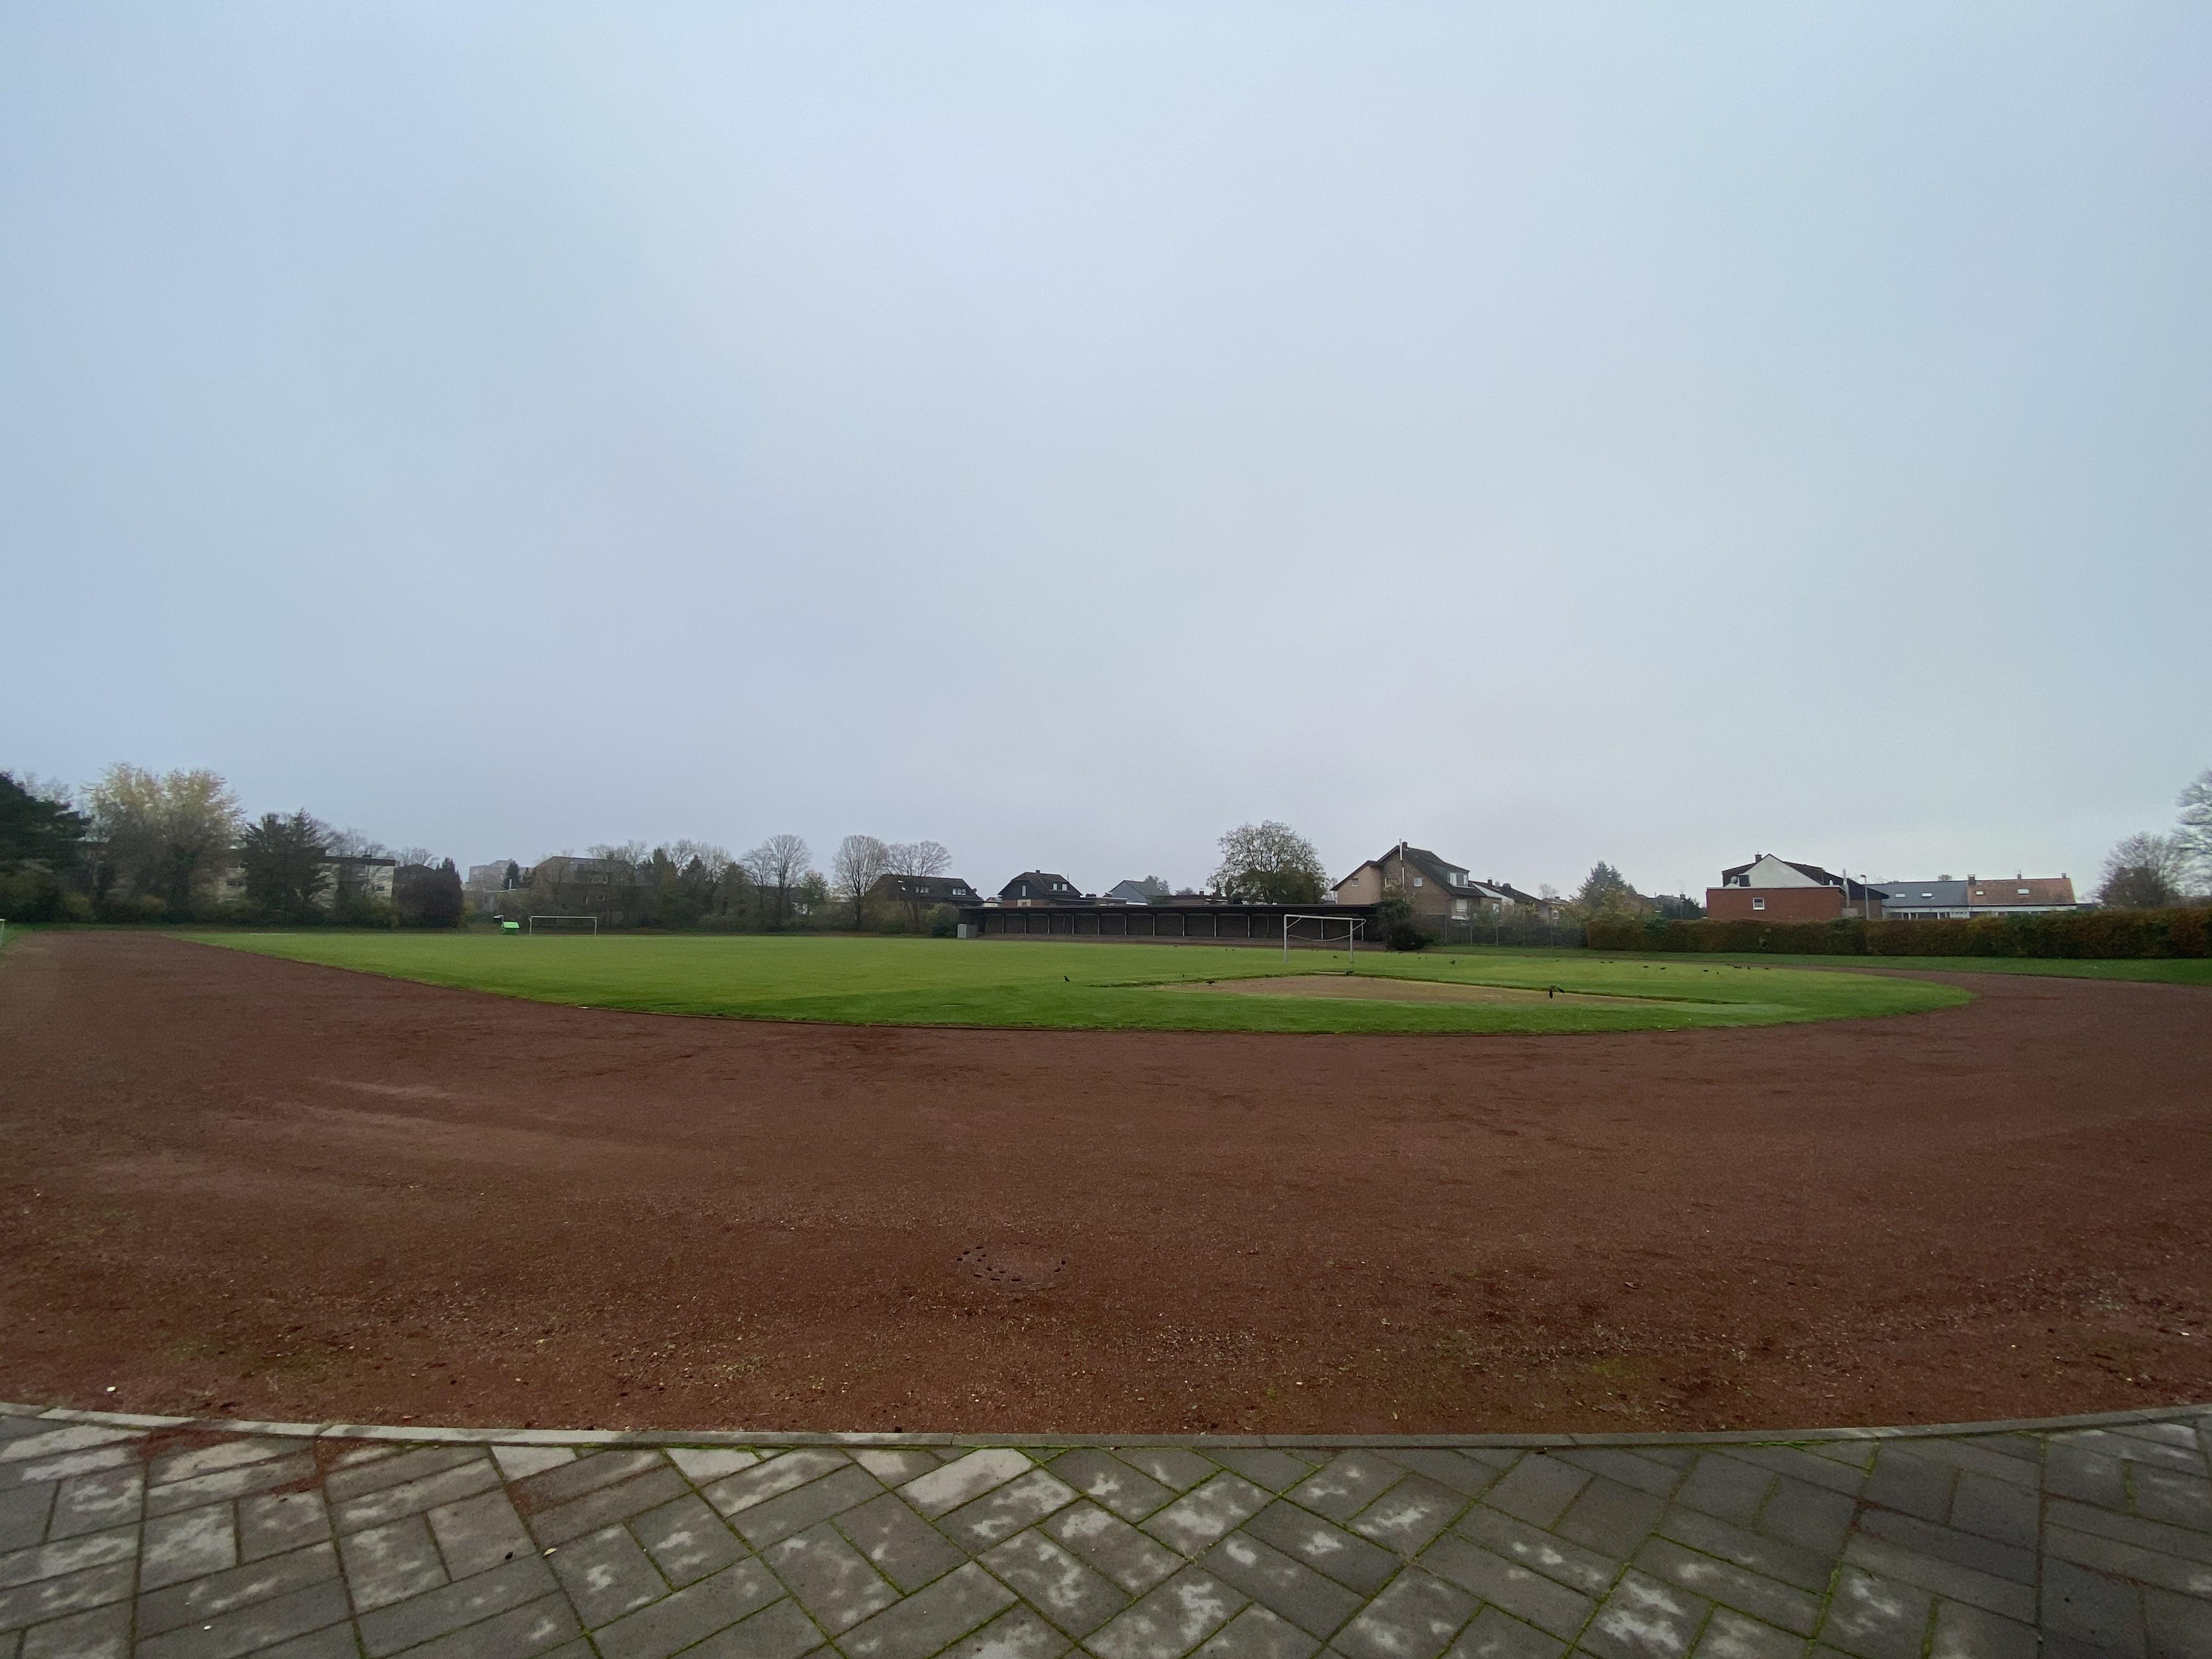 sportplatz2.jpg